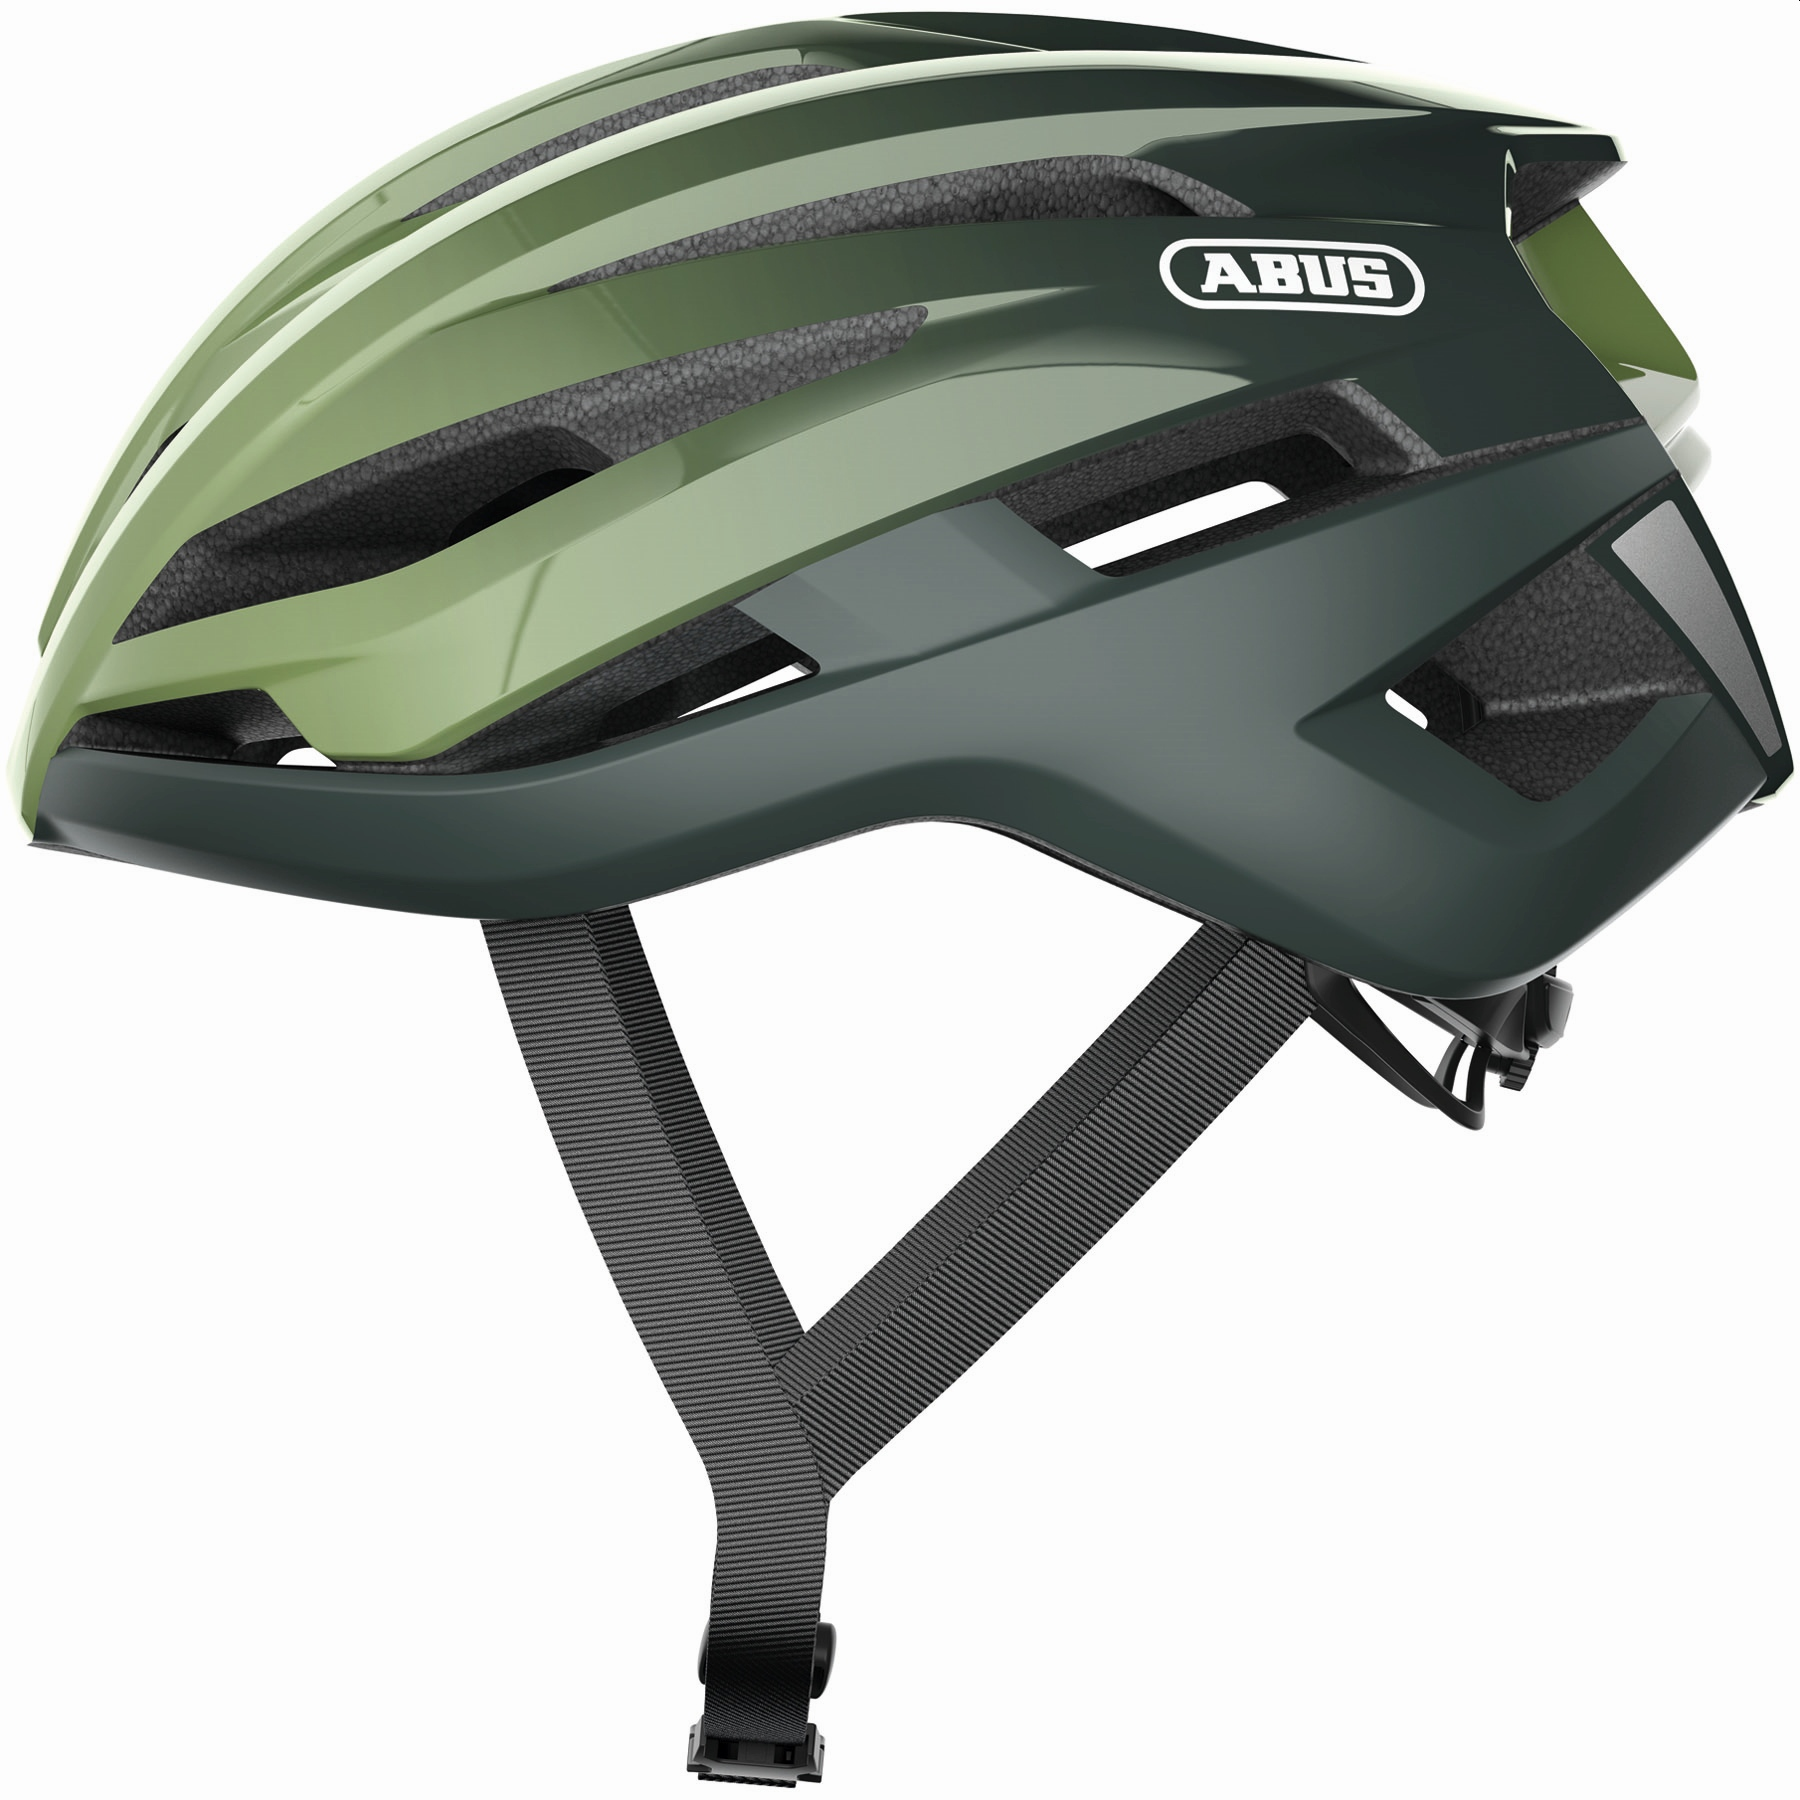 ABUS StormChaser Casco Carretera - opal green